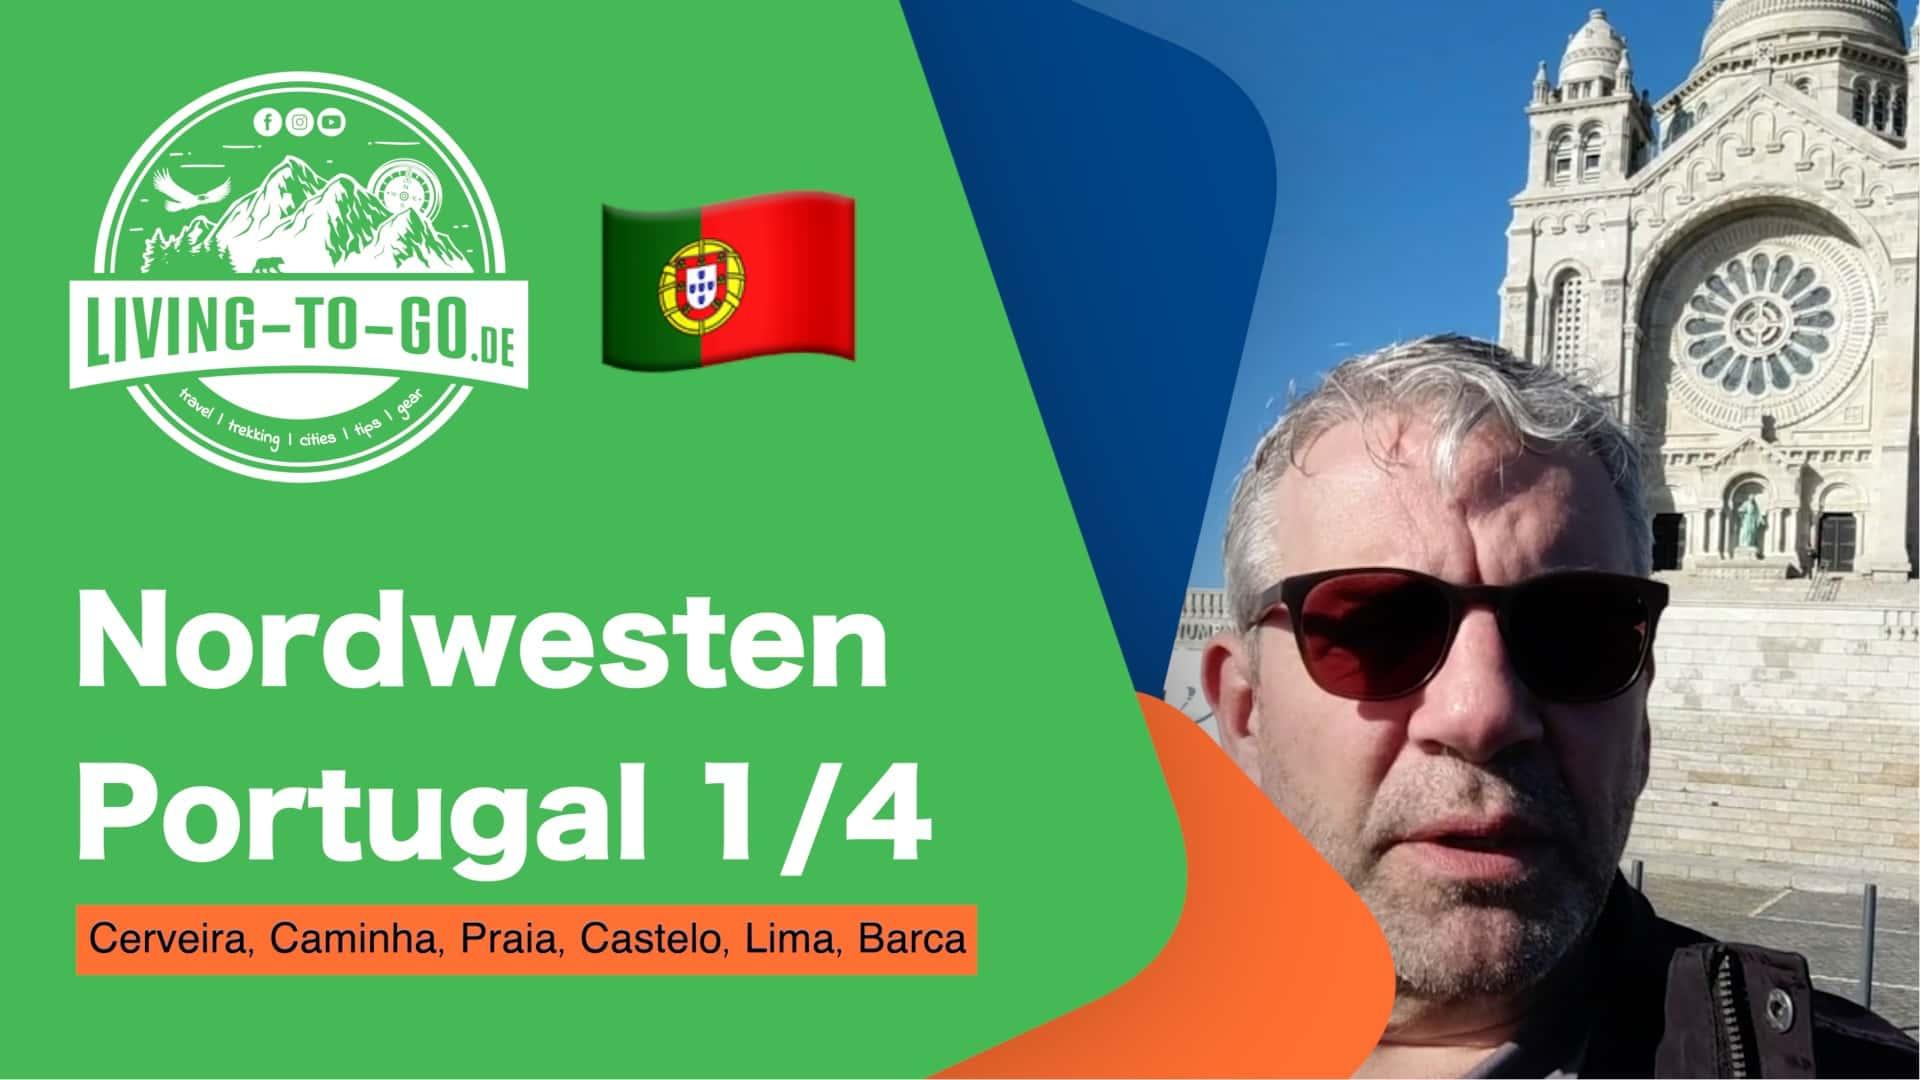 Nordwesten Portugal 1